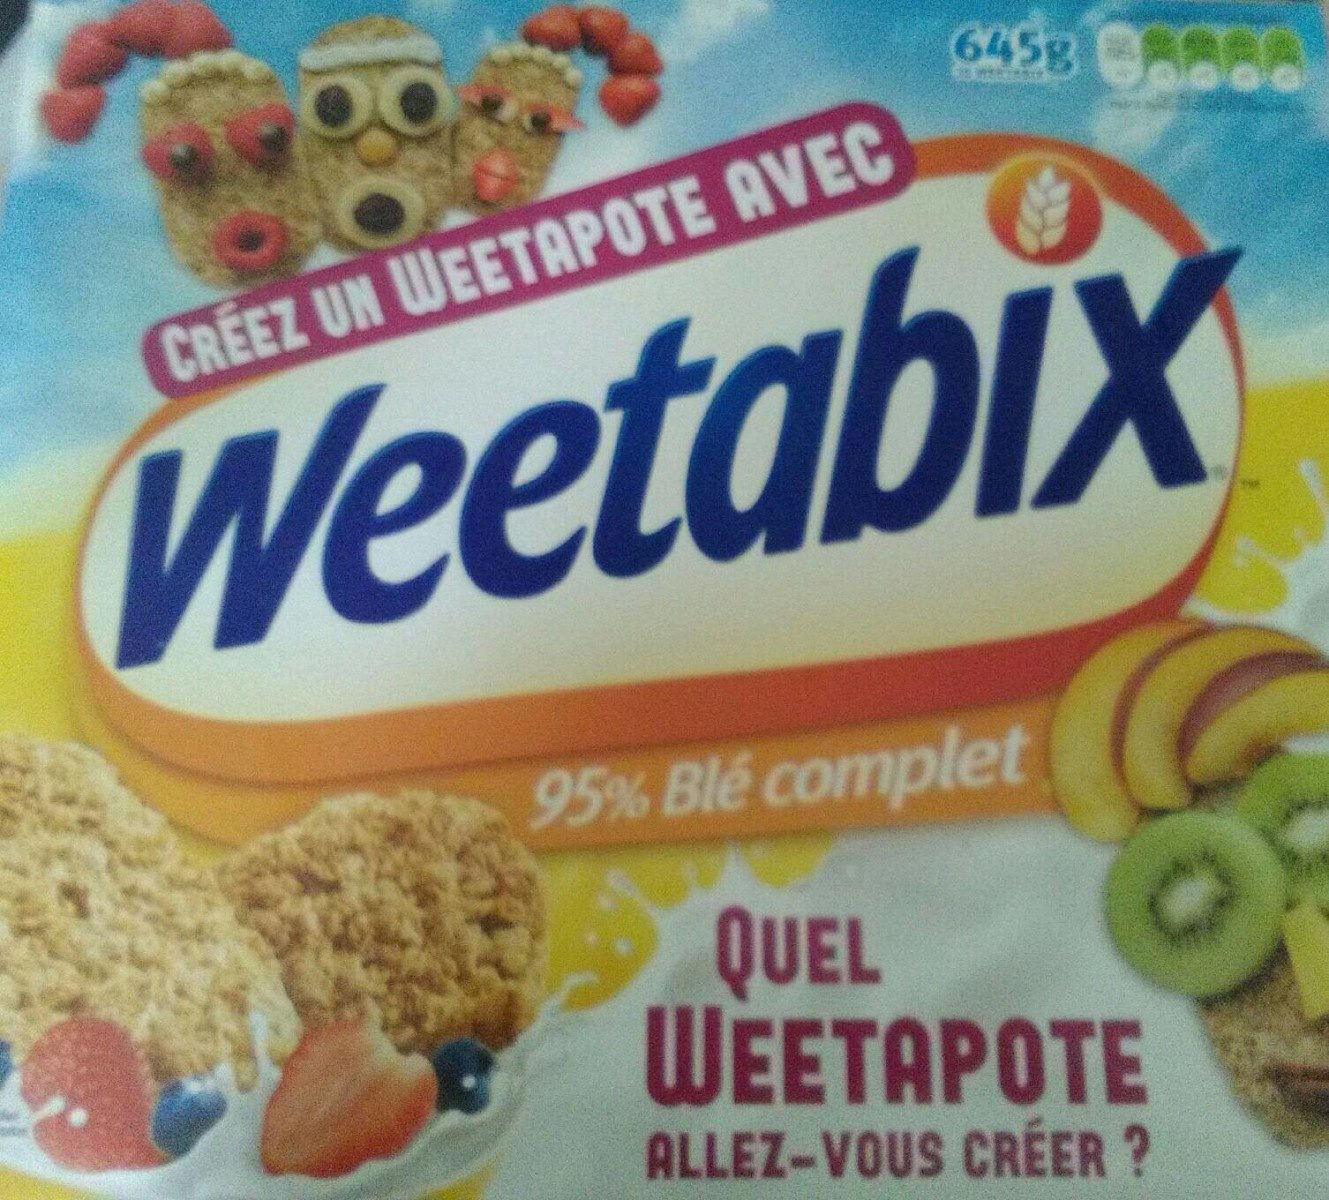 Weetabix - Product